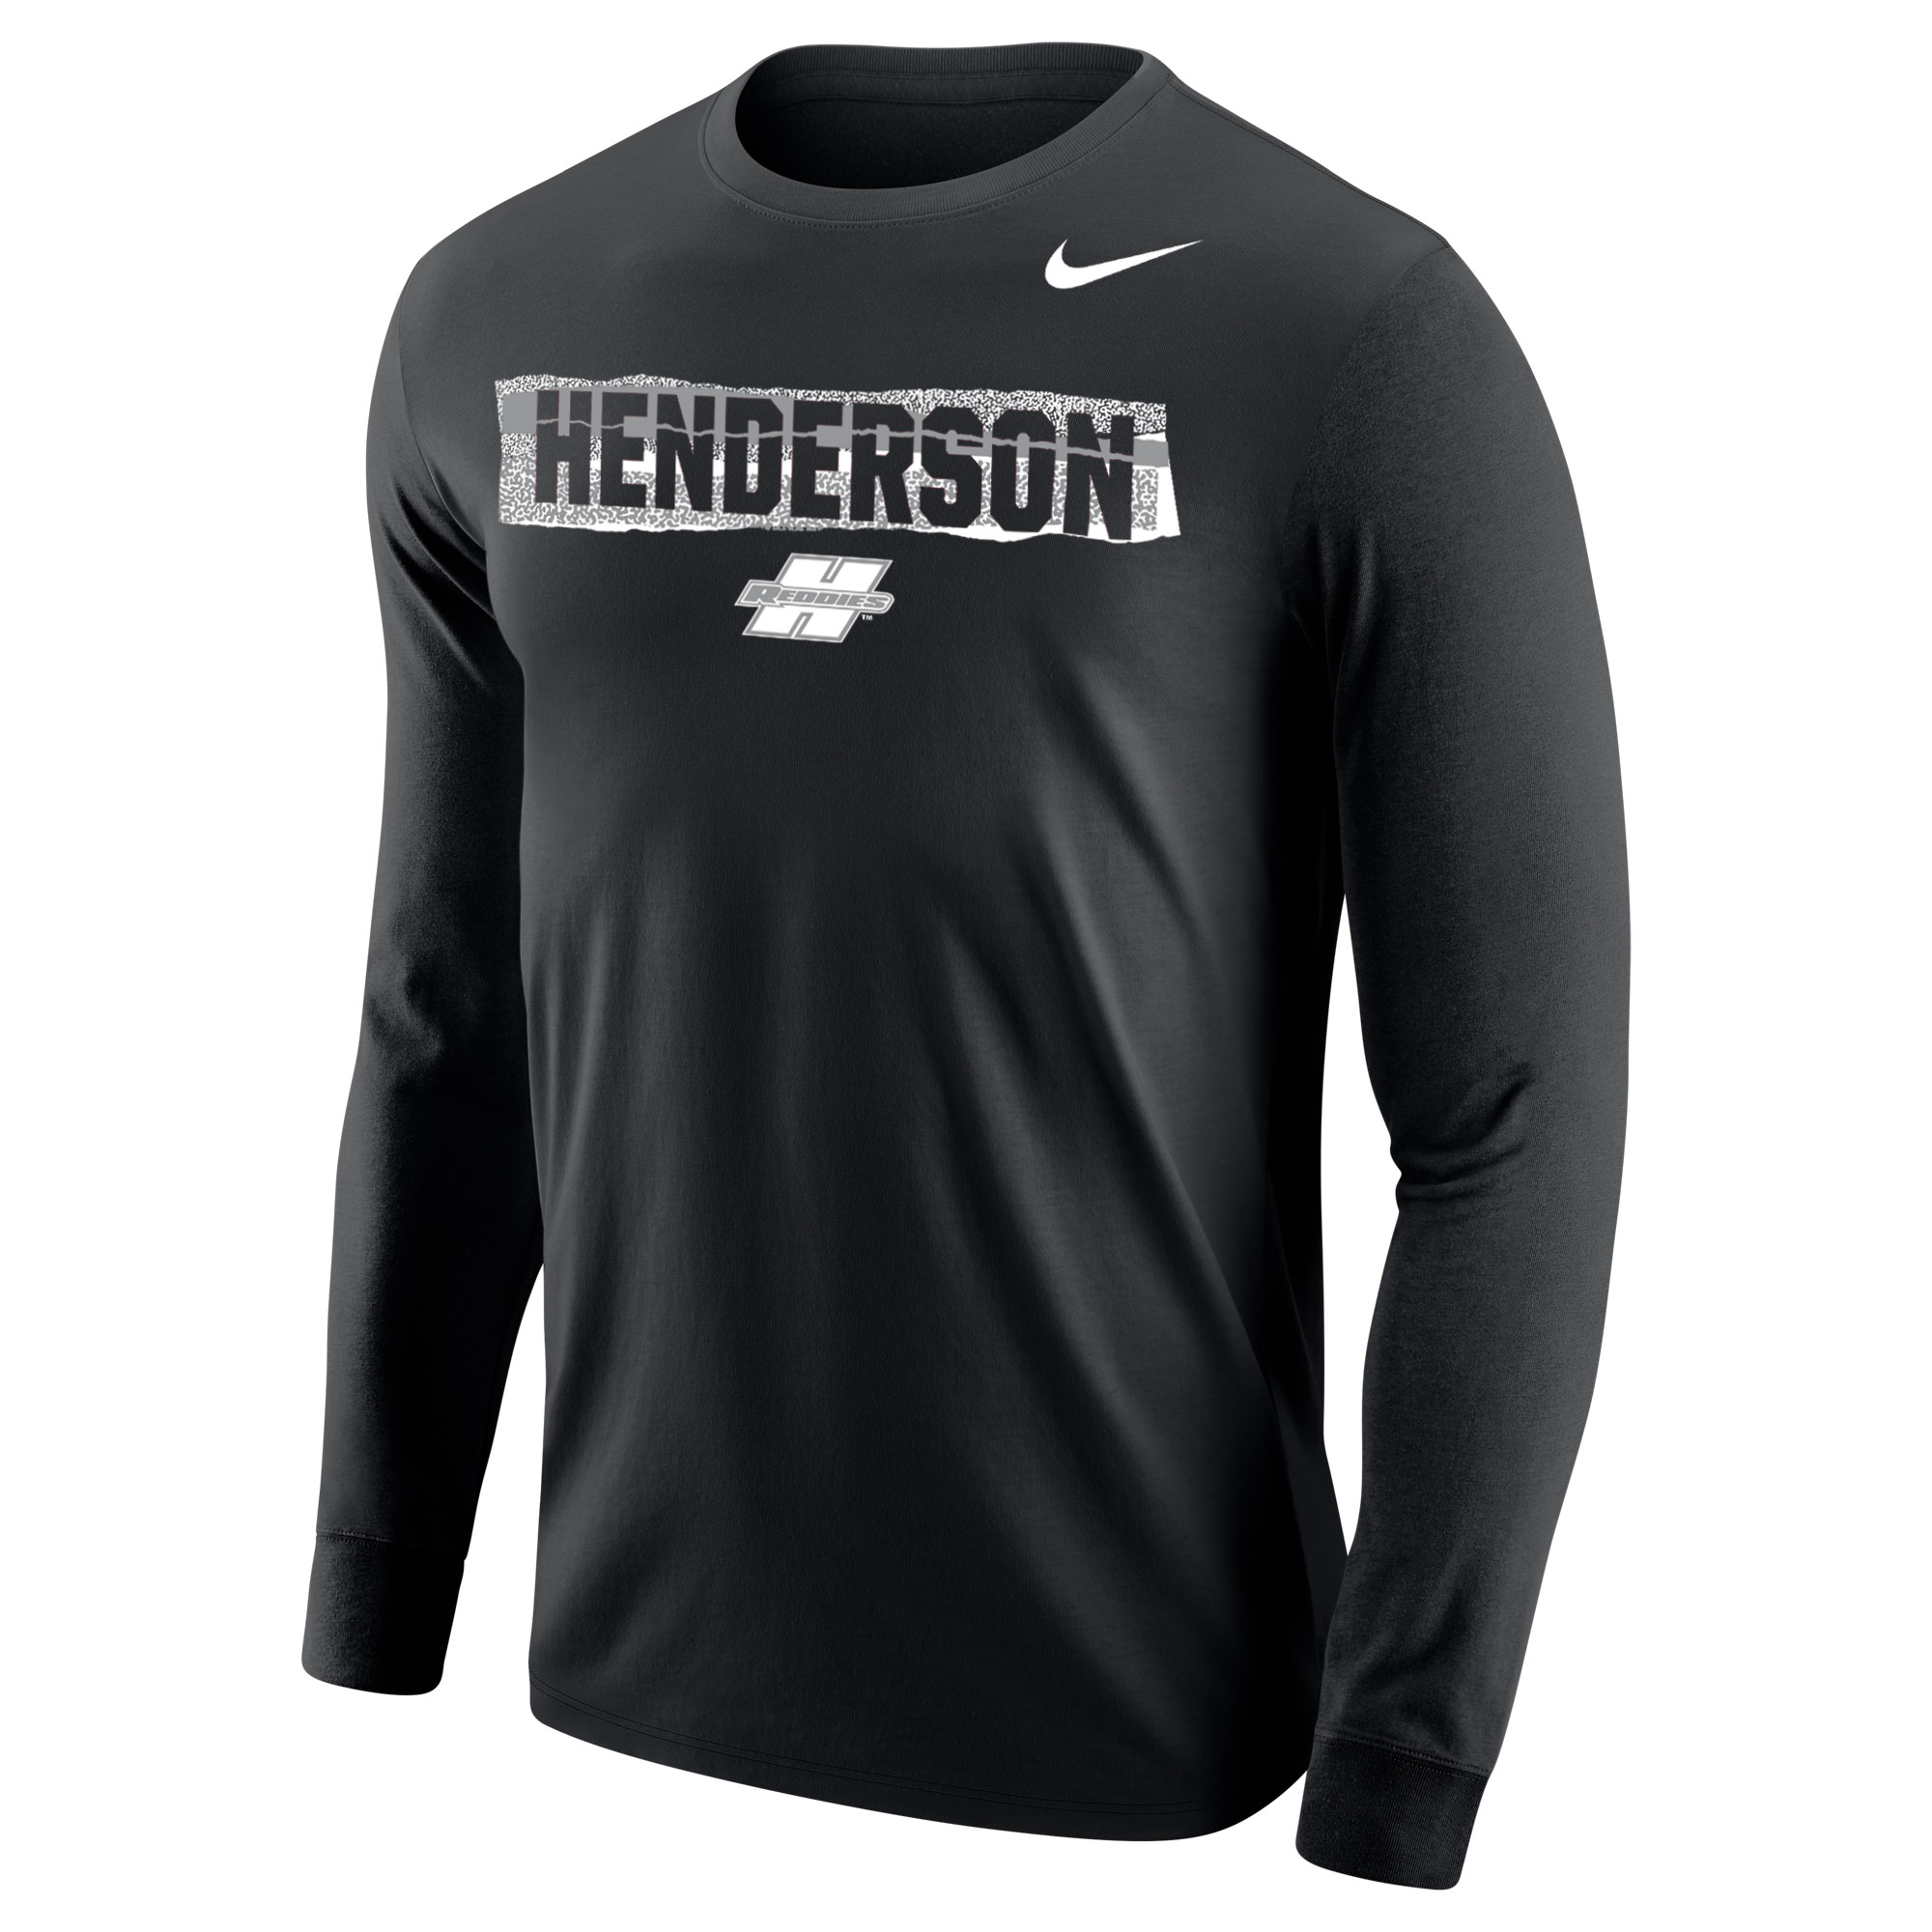 Henderson Reddies Core Long Sleeve T-Shirt